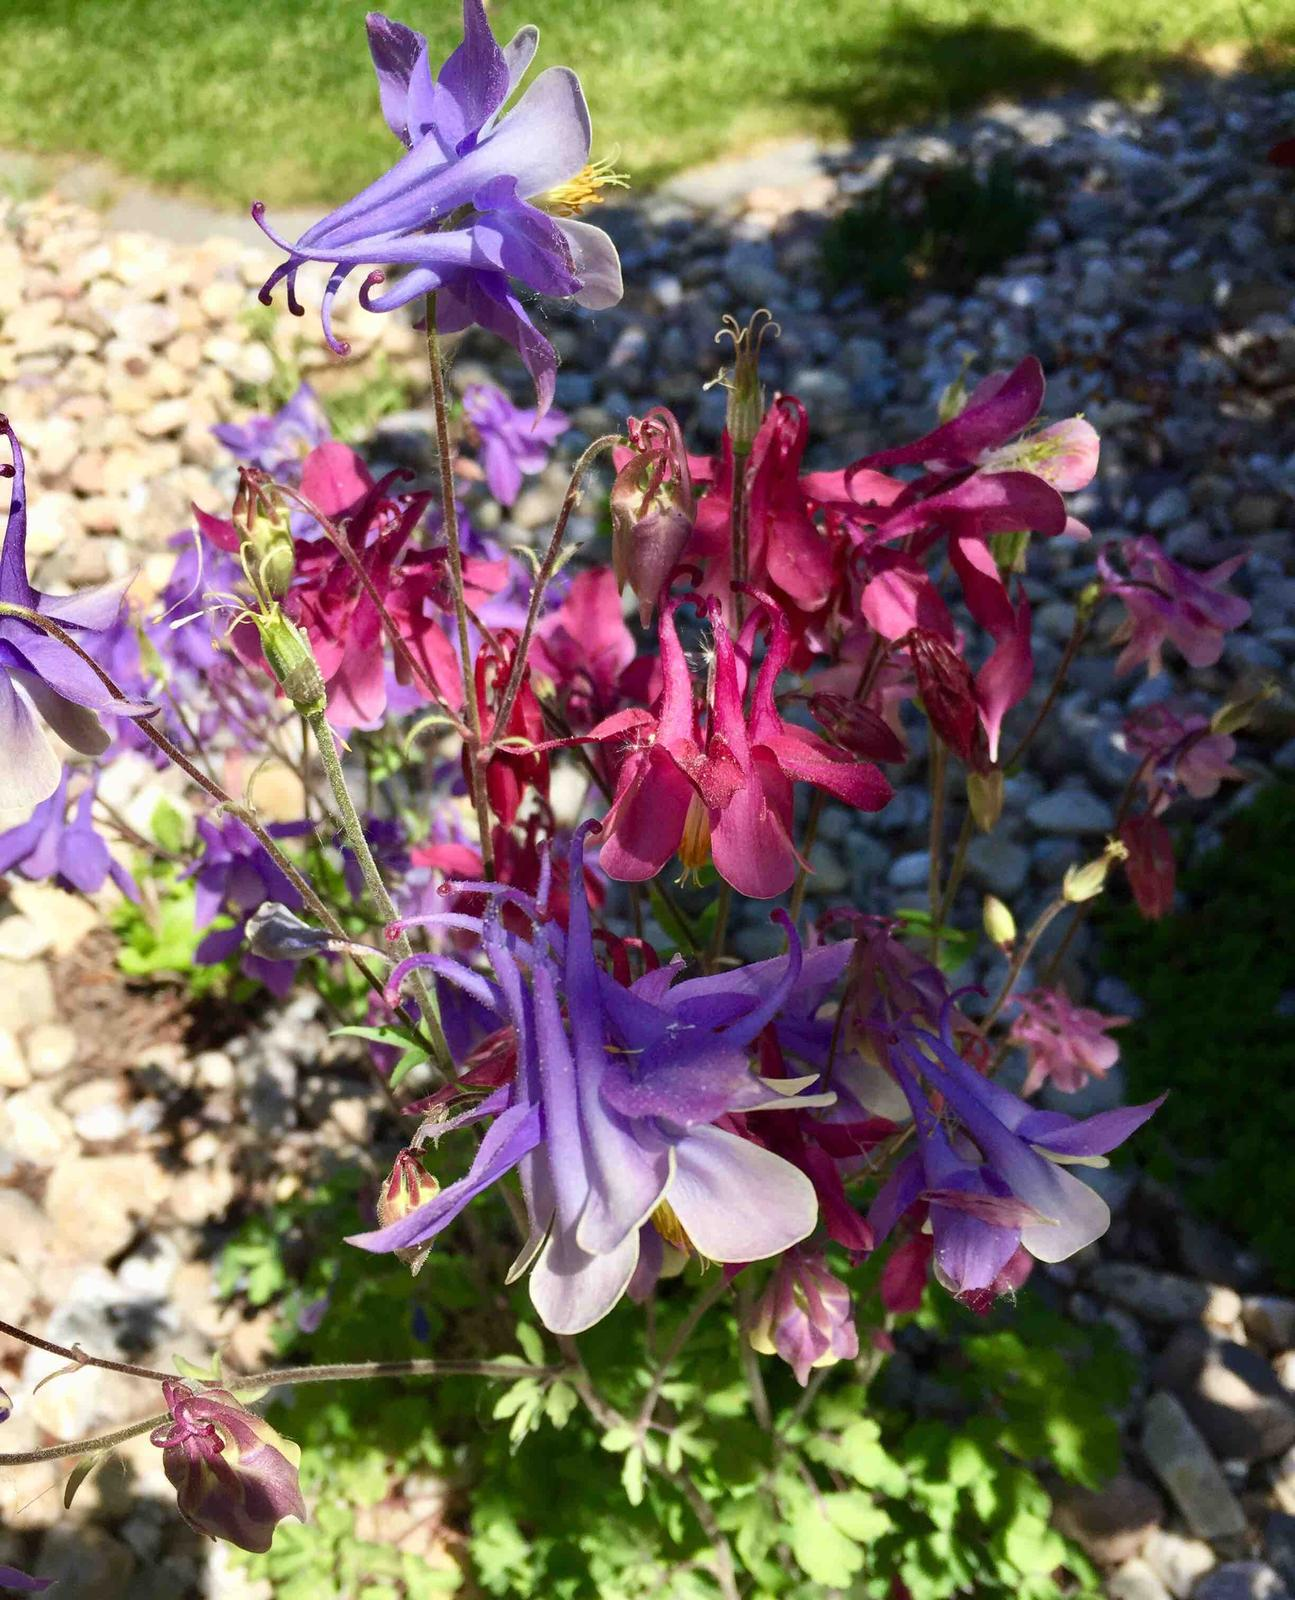 Naše barevná zahrada 🌸 - Orlíček darovaný od tety, z jednoho trsu kvetou tři různé barvičky 🤗